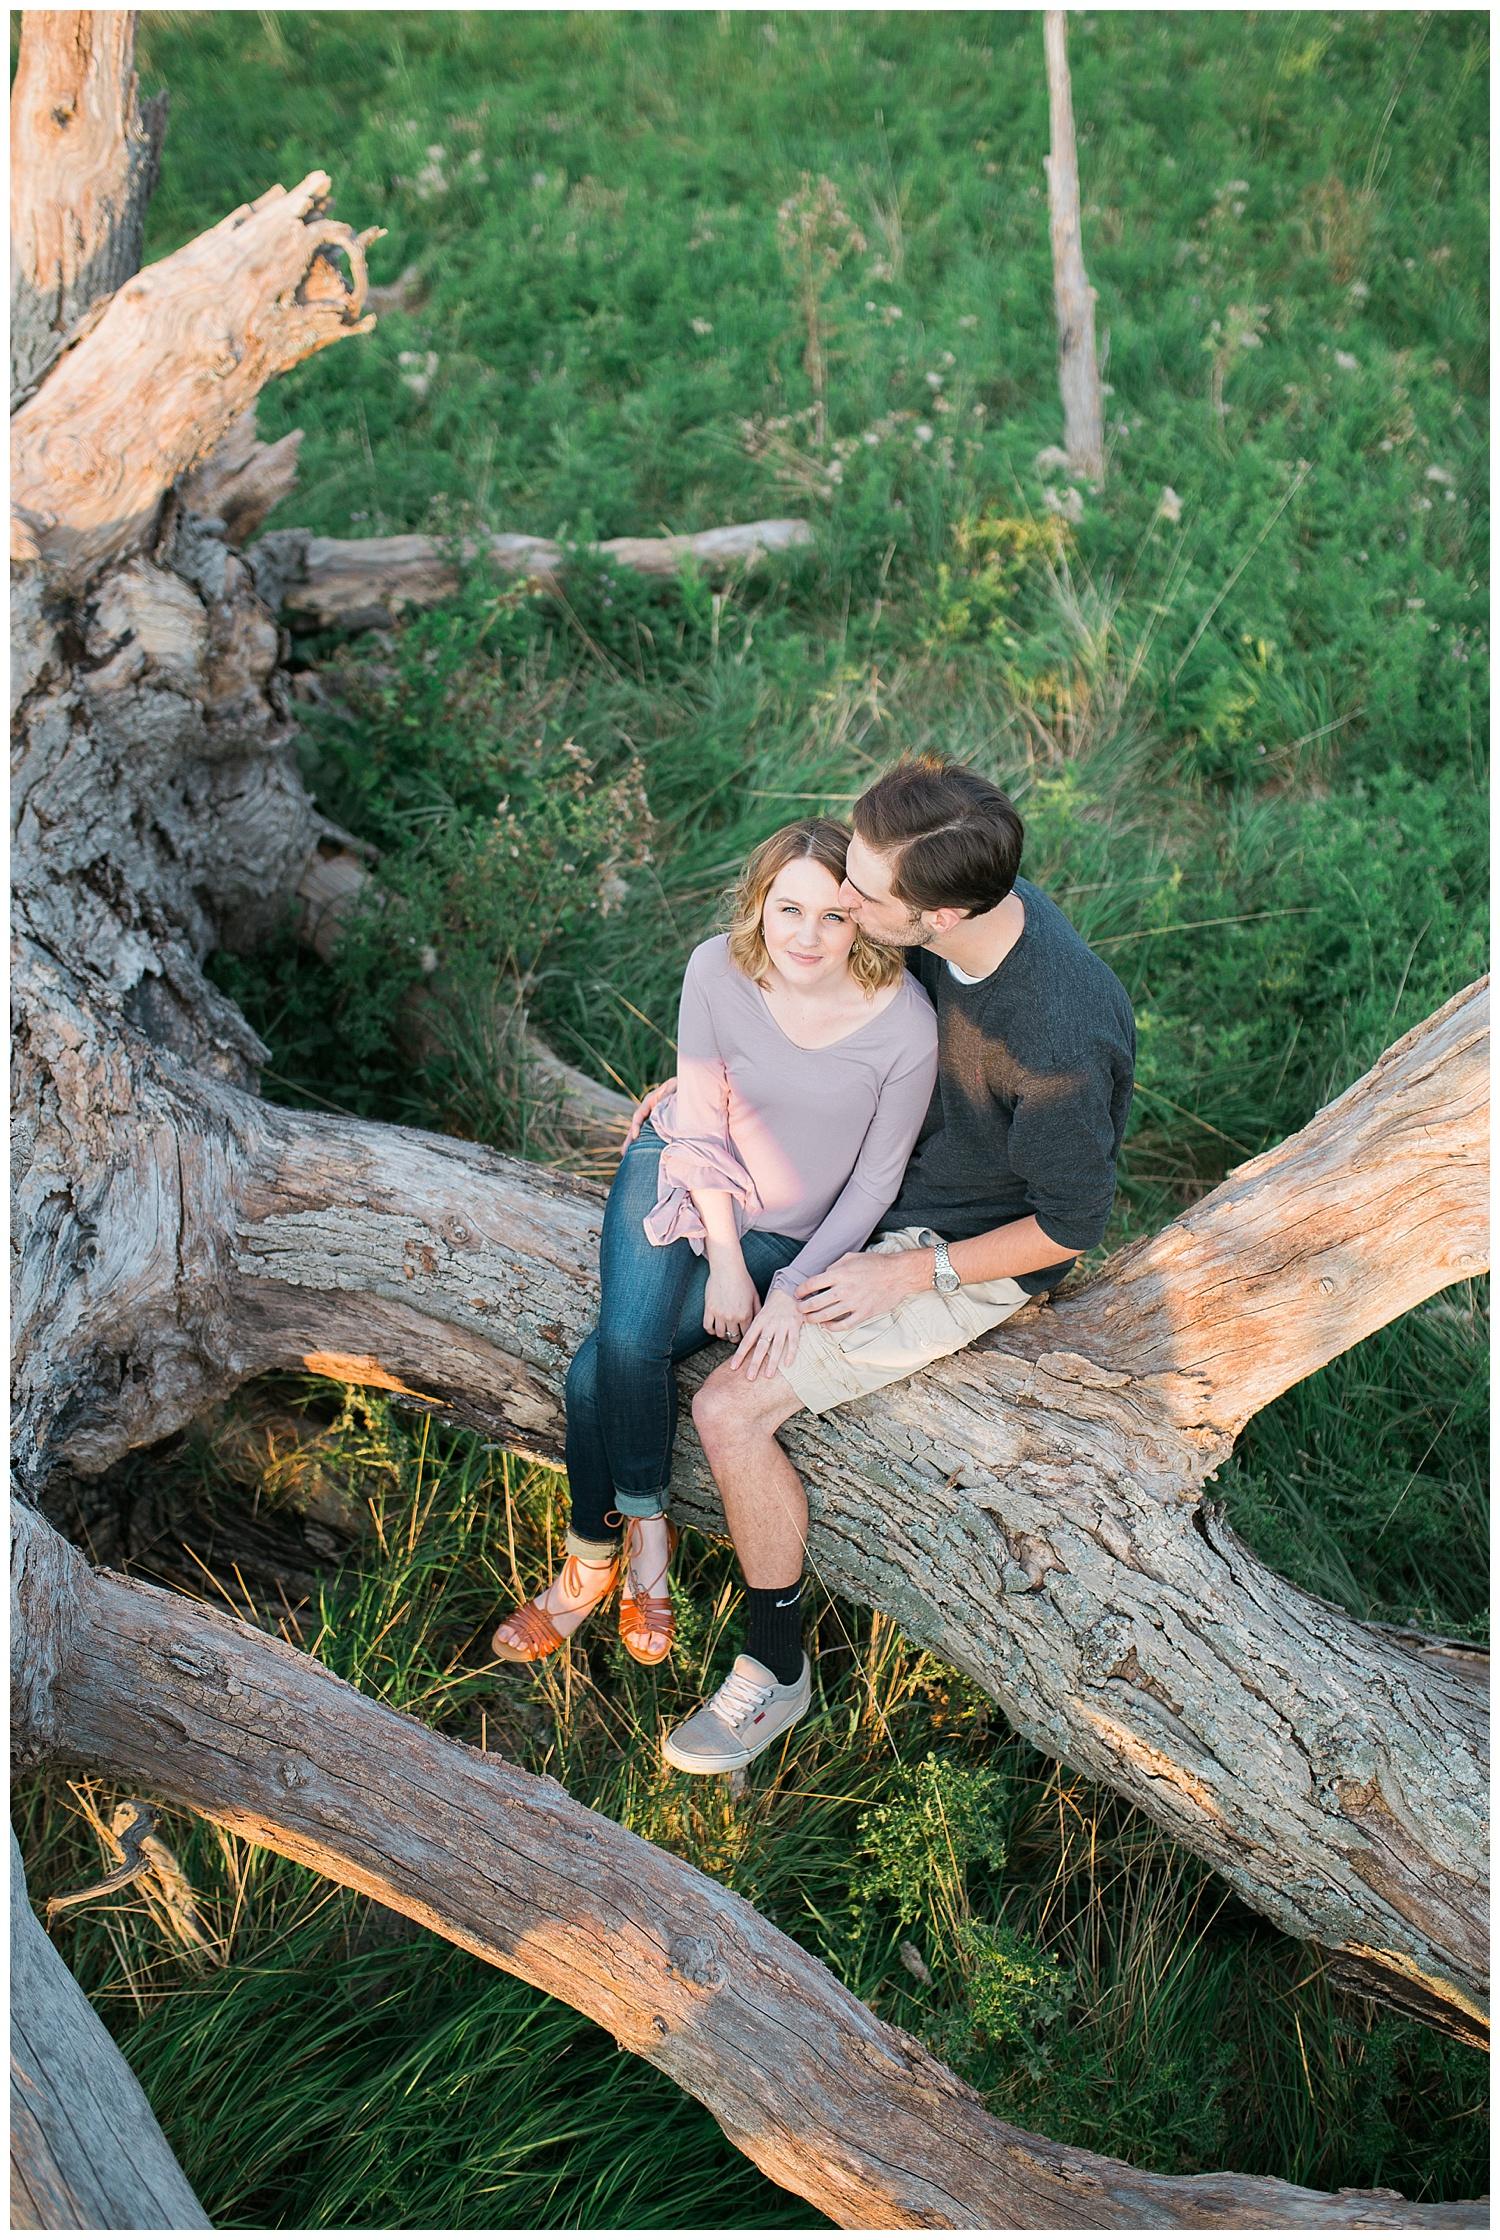 Tanya and Ryan - Sweetheart session - Lass & Beau - Geneseo NY-281_Buffalo wedding photography.jpg